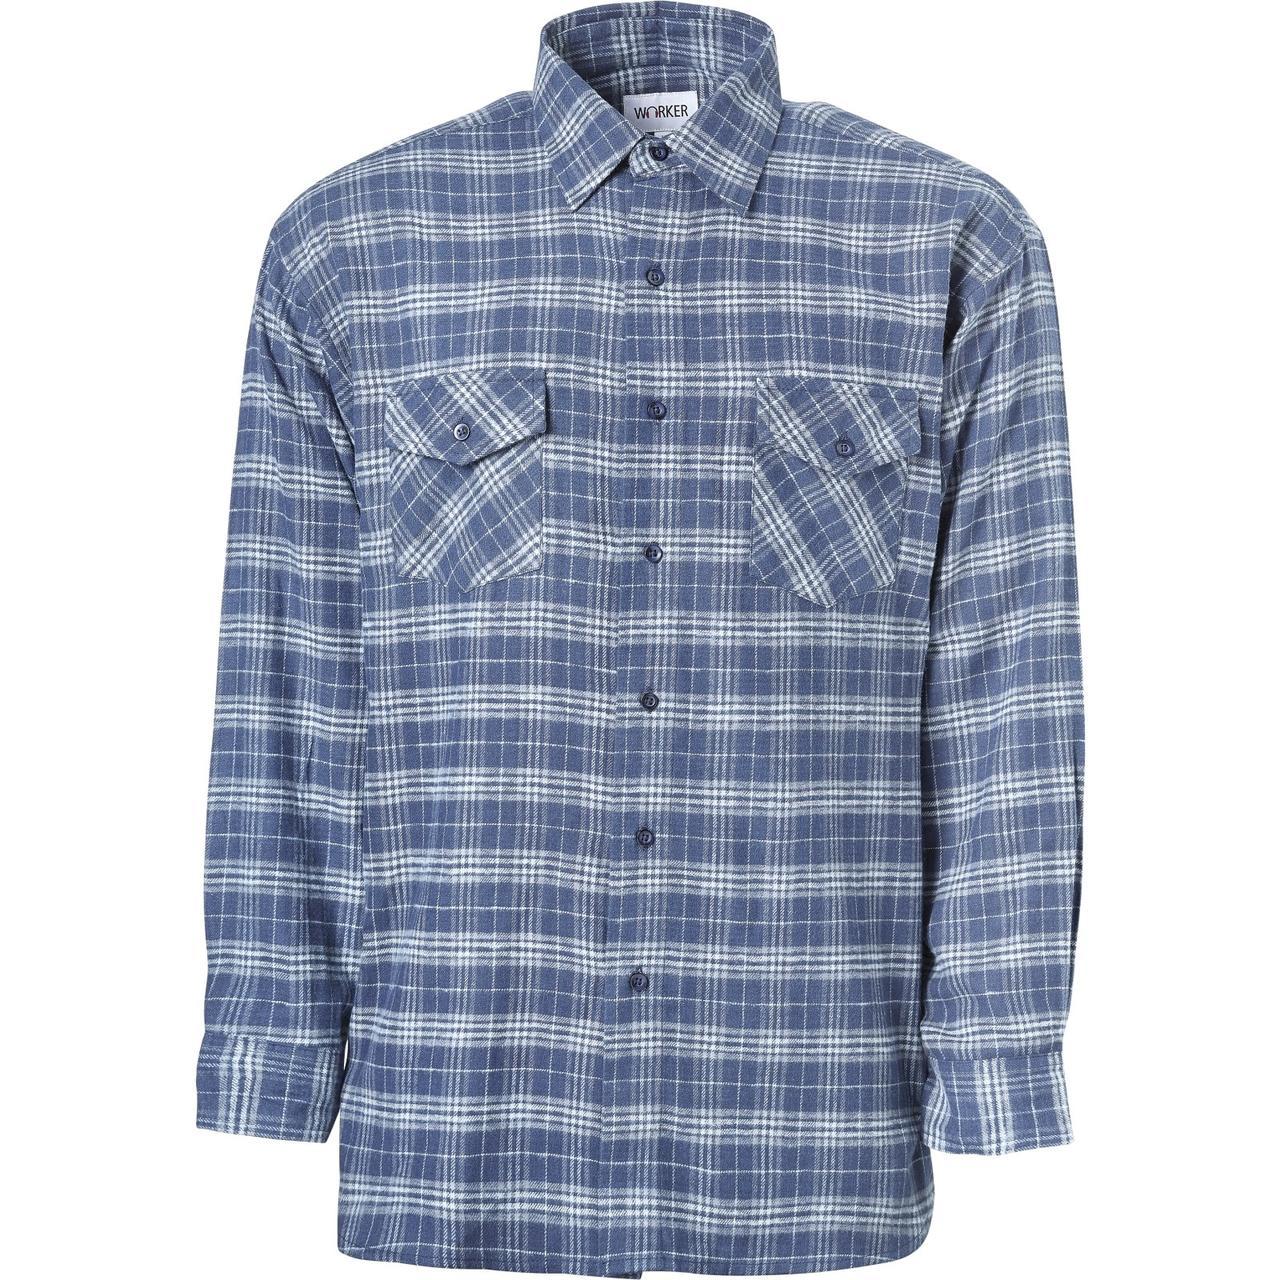 a4b28769d22 Купить Рубашку мужскую фланелевую